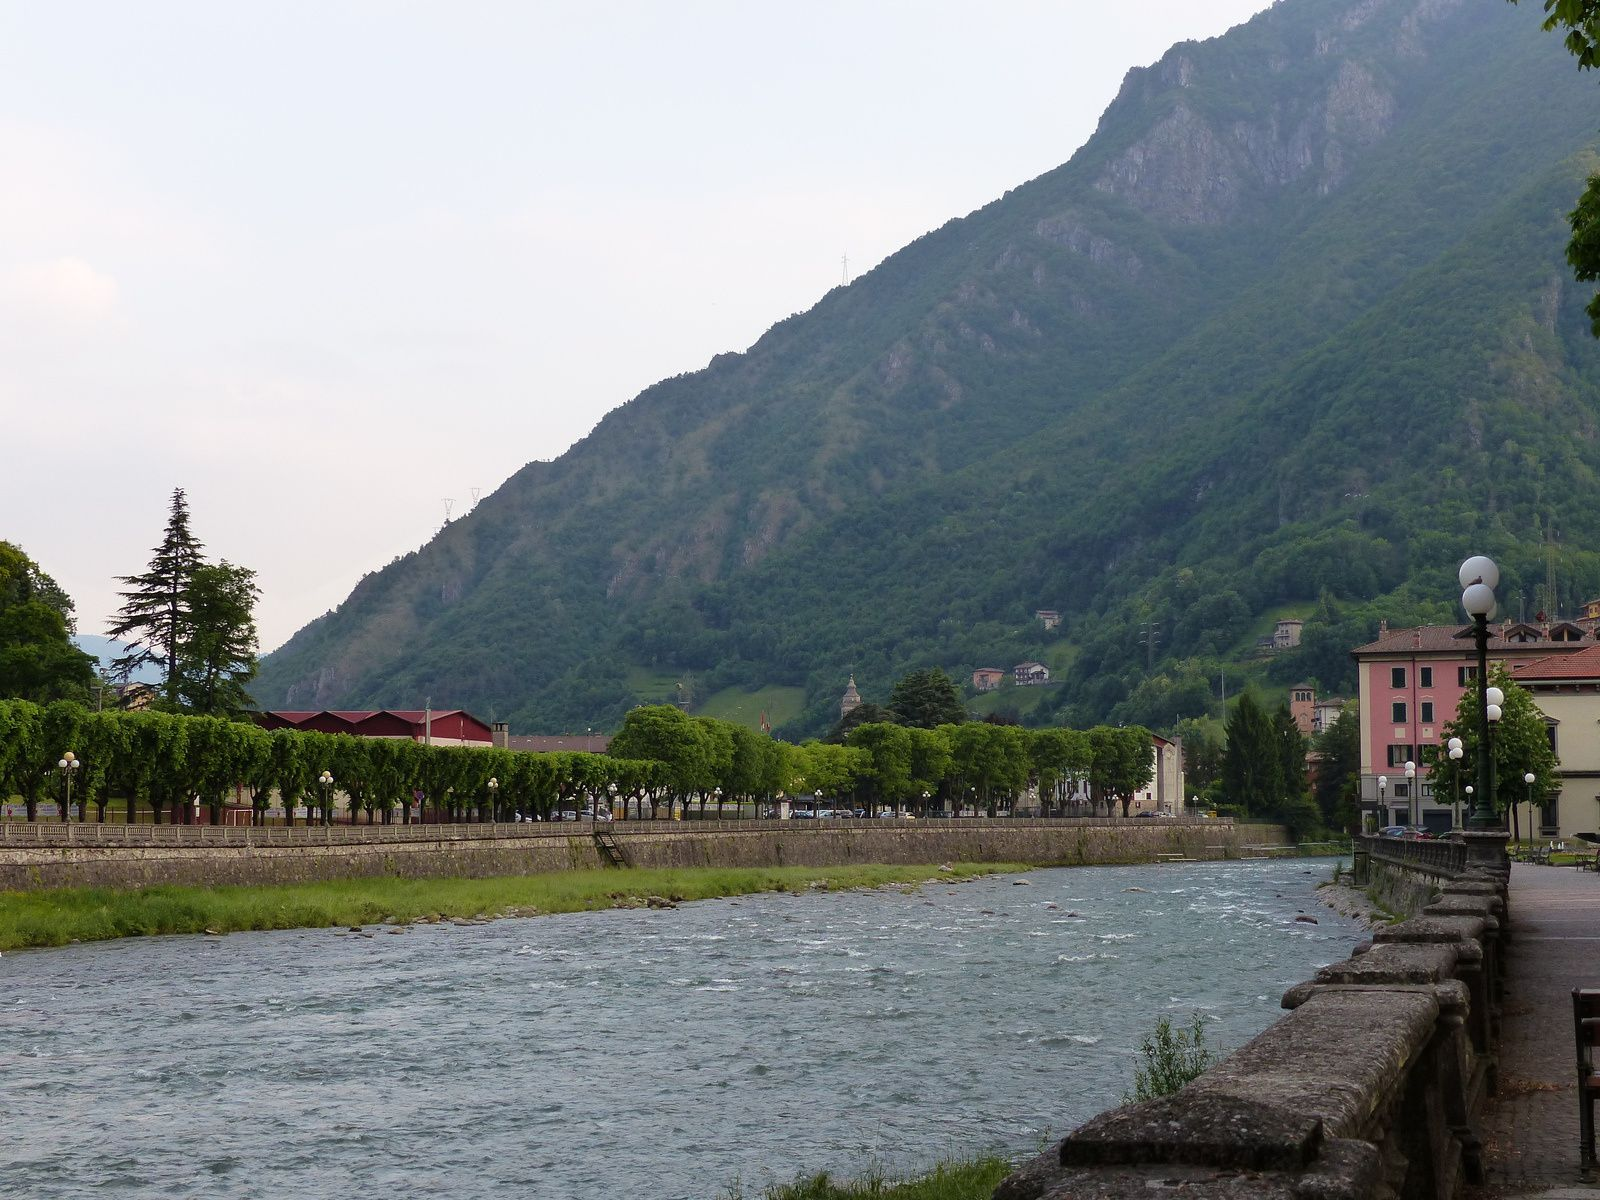 San Pellegrino et son grand hôtel